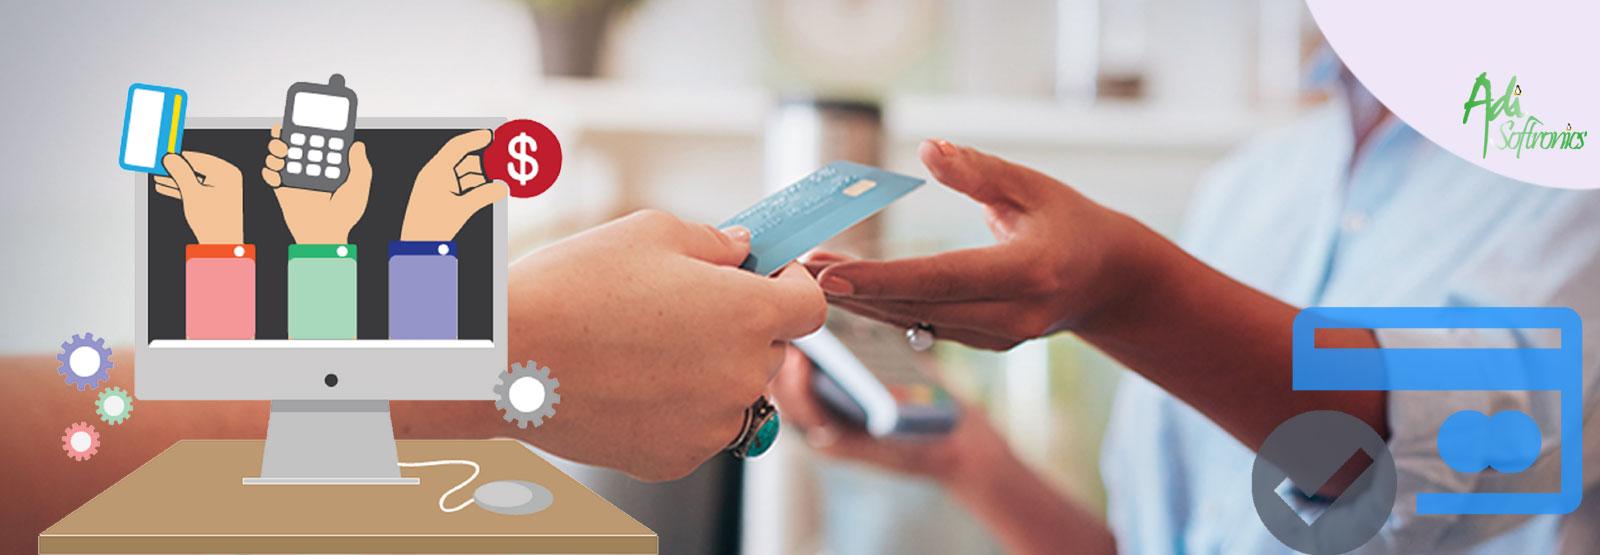 PAY U MONEY gateway integration